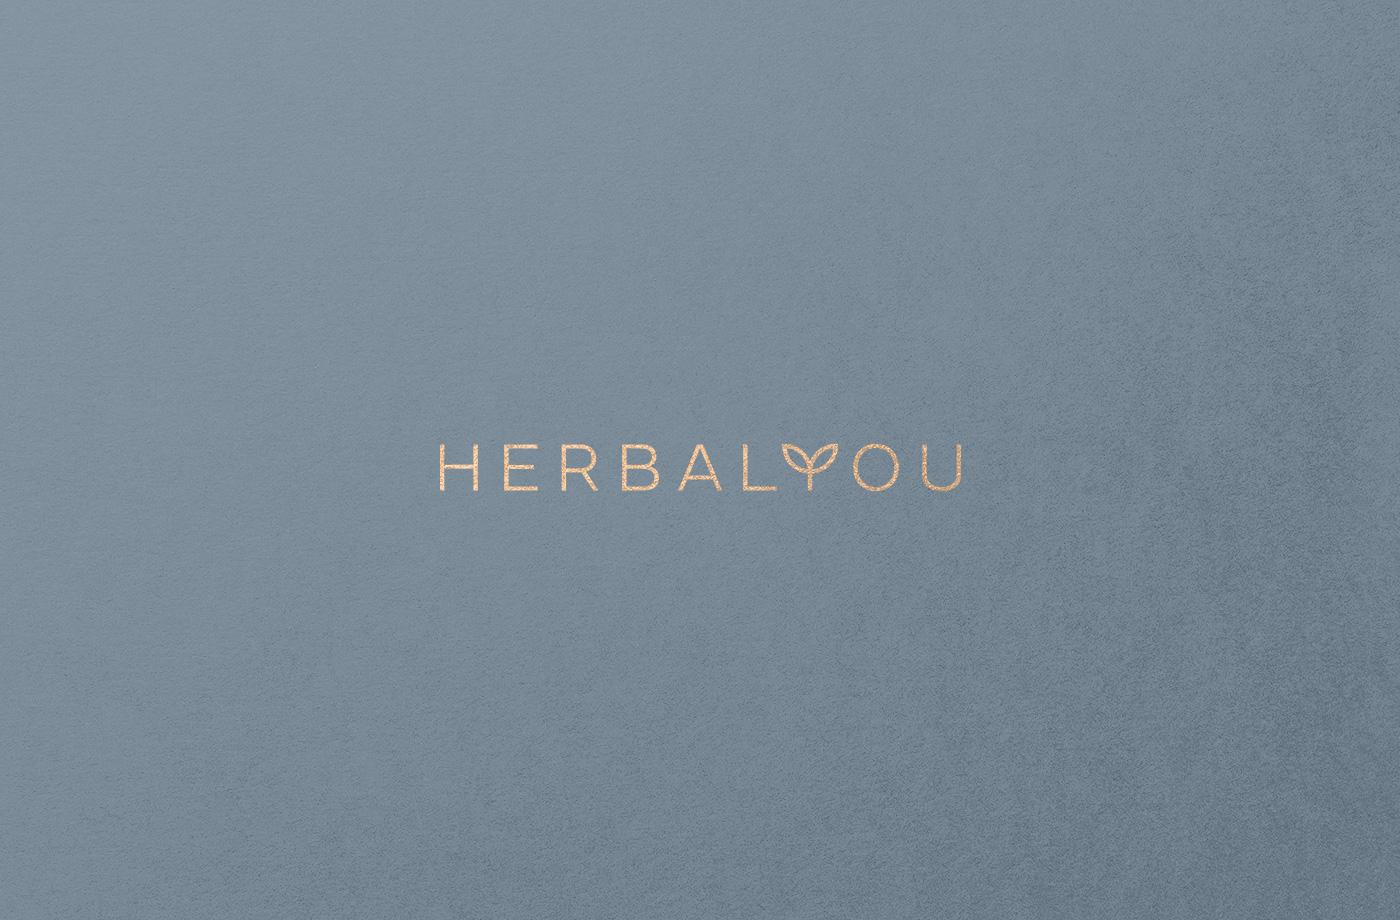 herbalyou-company-brand-01.jpg